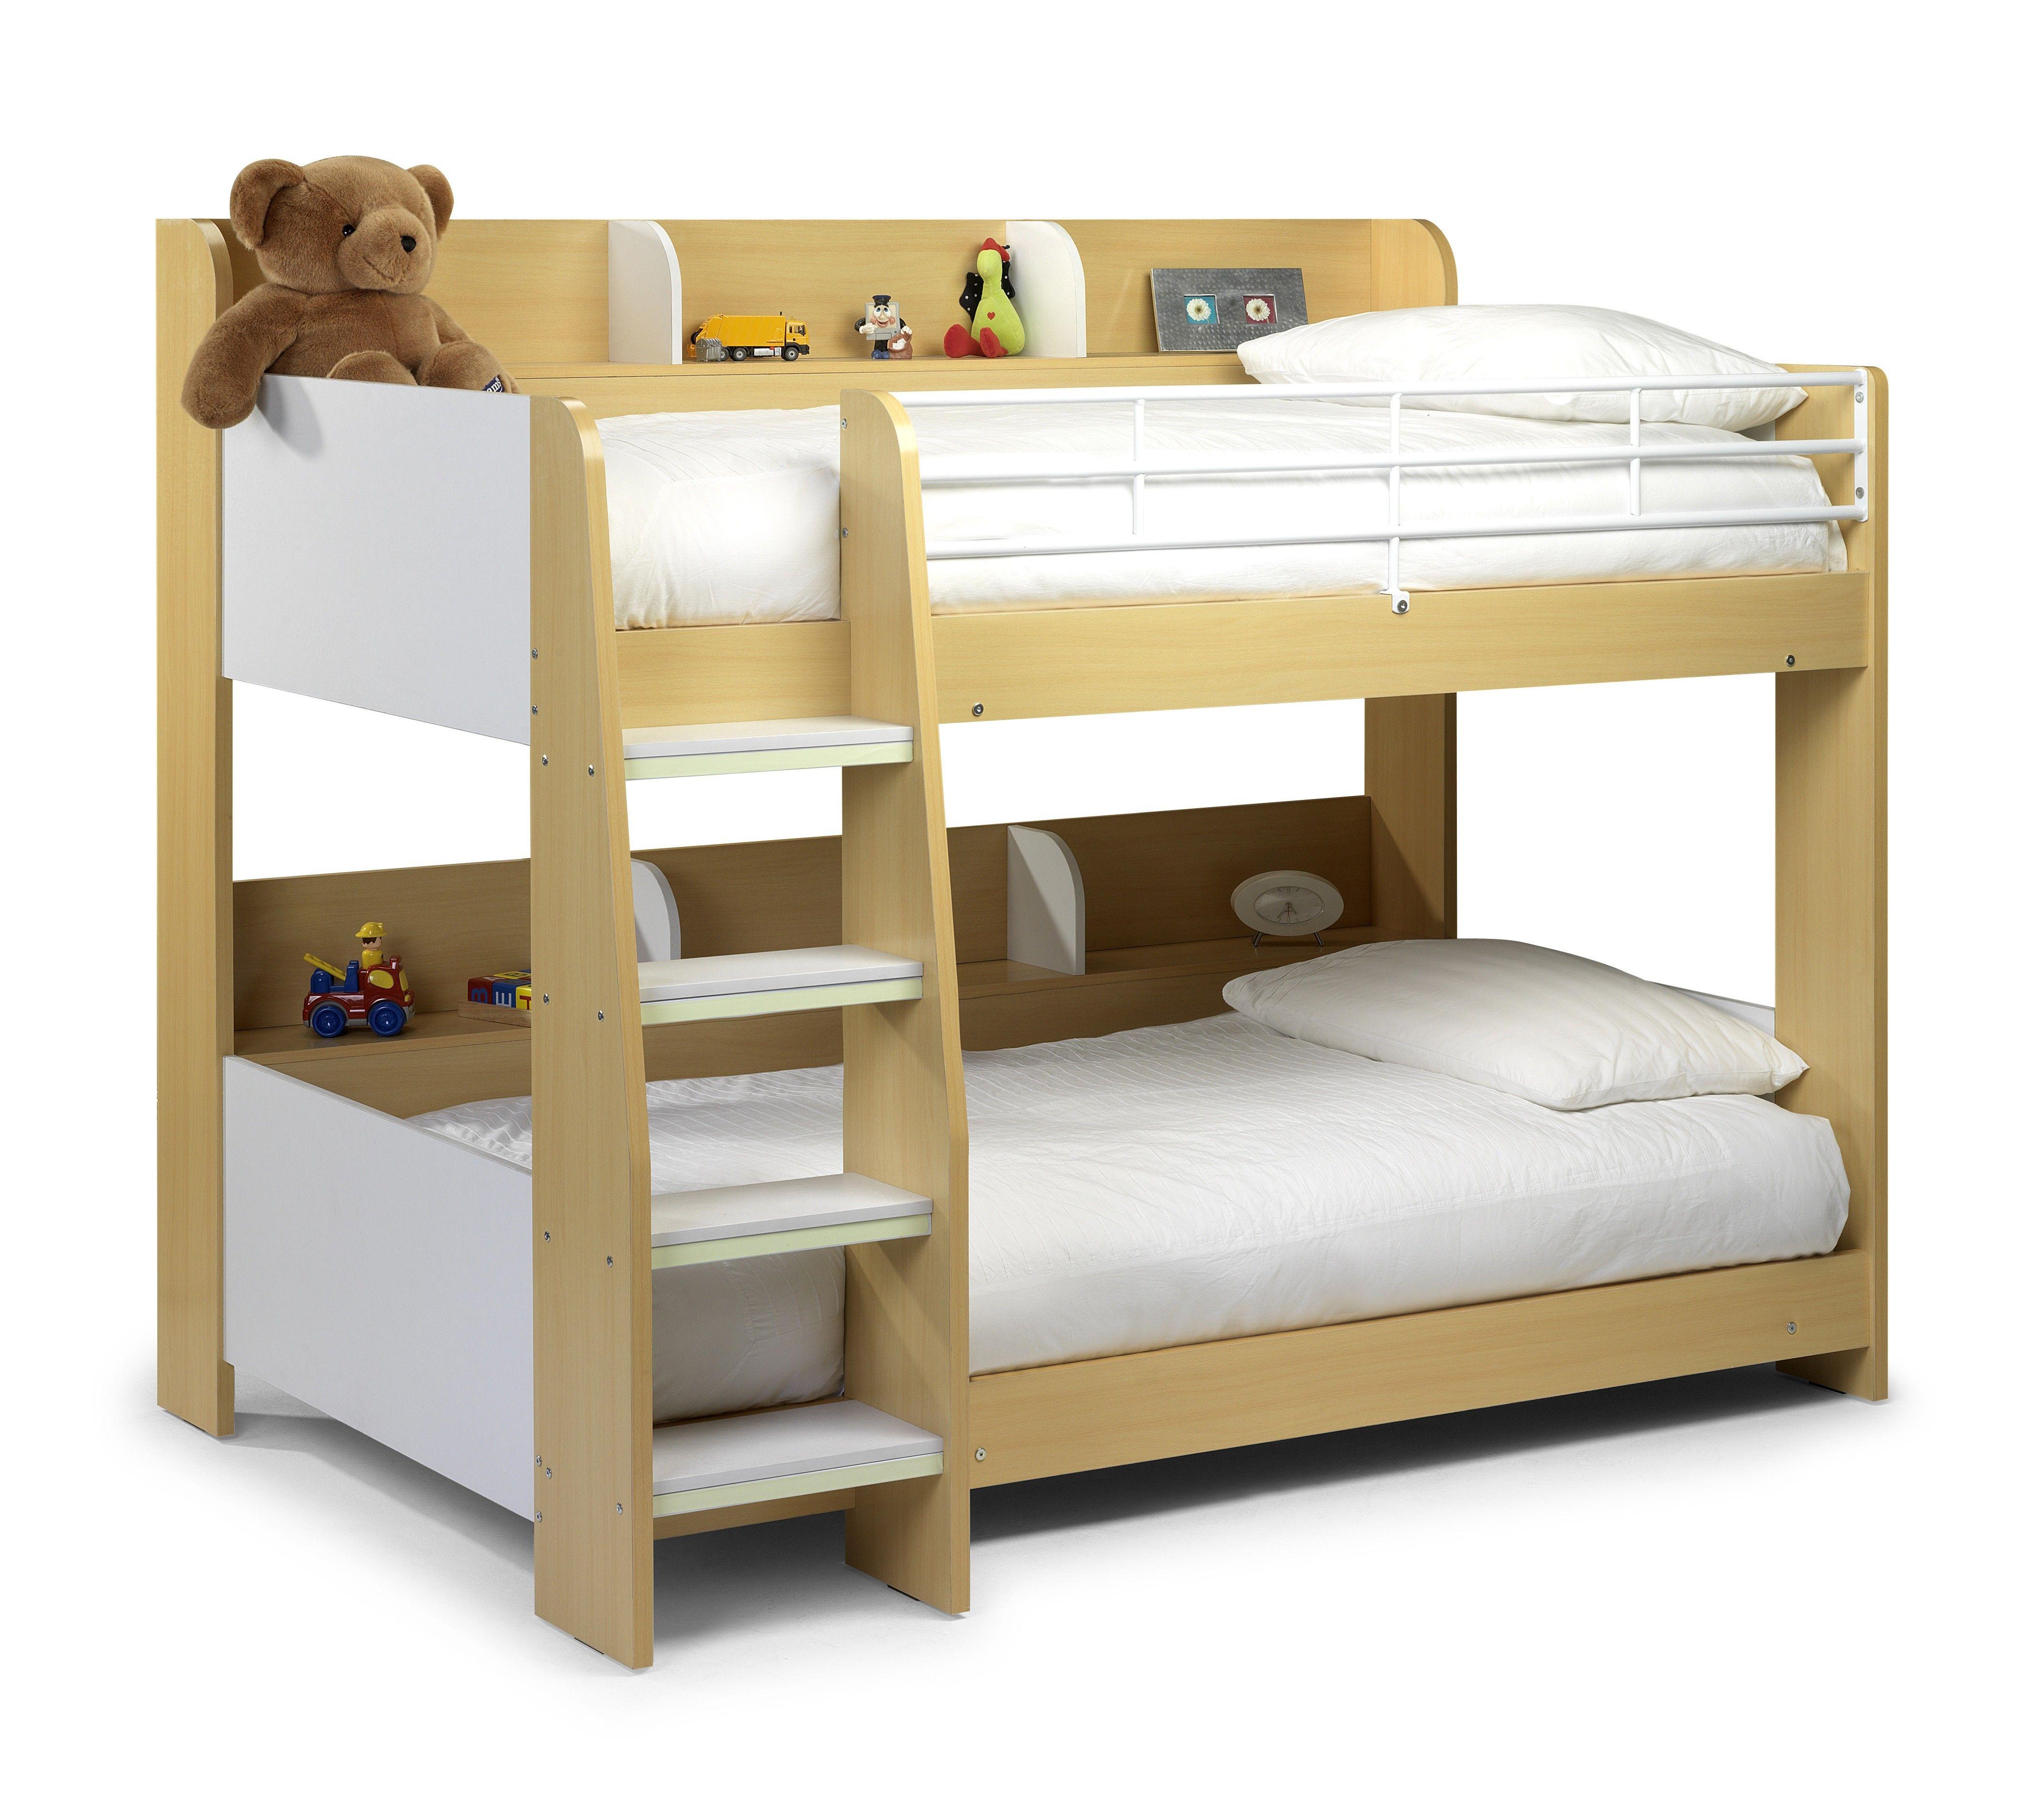 Best £280 Julian Bowen Domino Maple Bunk Bed New Low Price 640 x 480